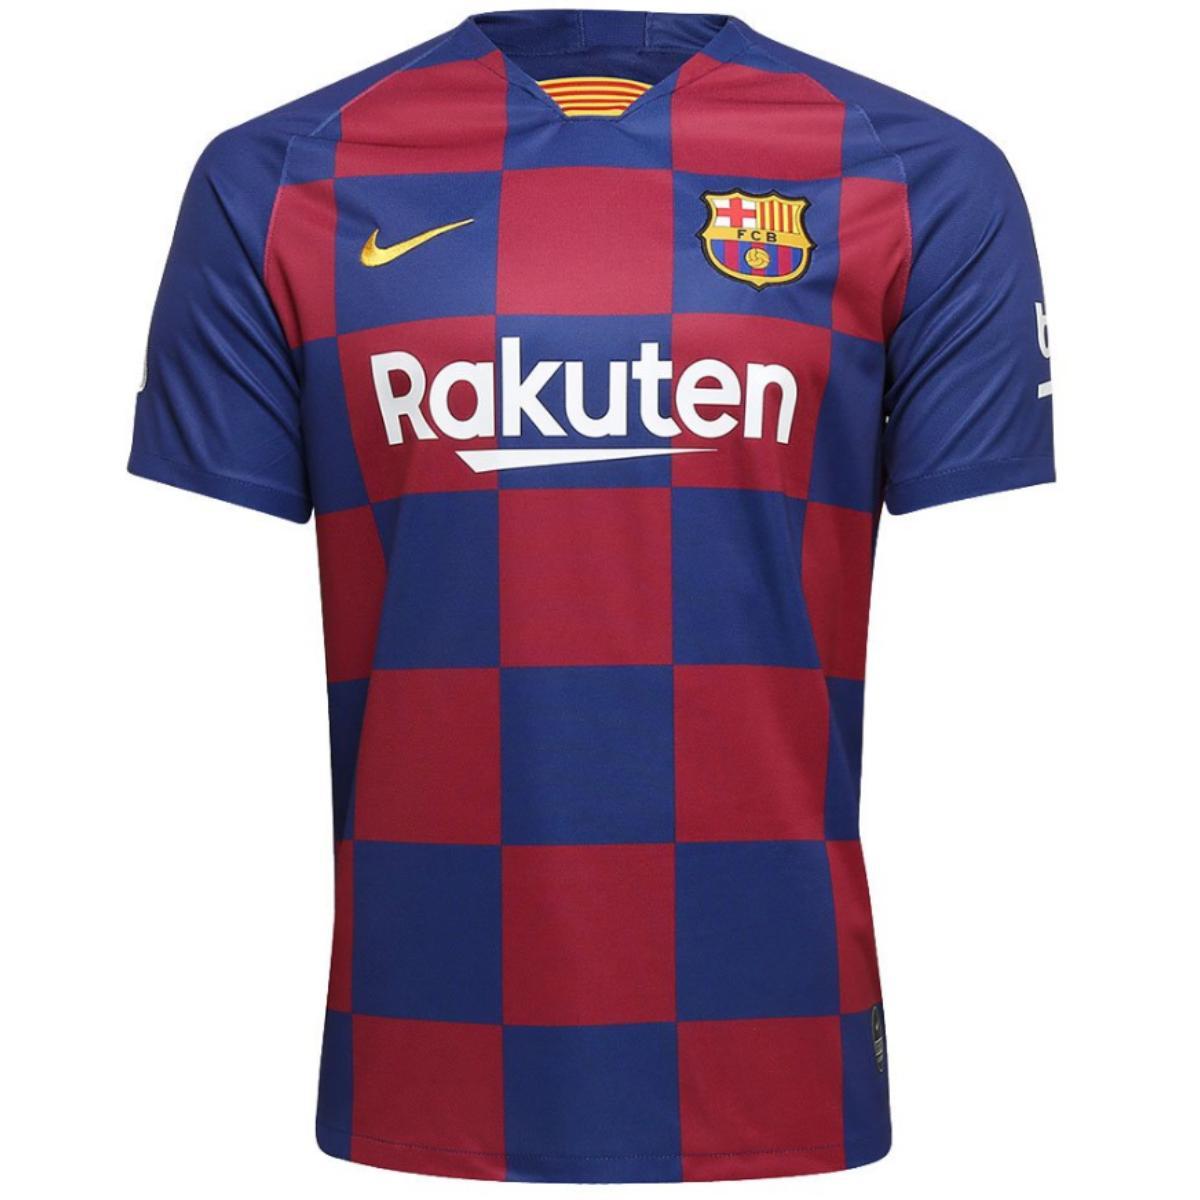 Camiseta Masculina Nike Aj5532-456 Barcelona Stadium 2019/20 Royal/vermelho